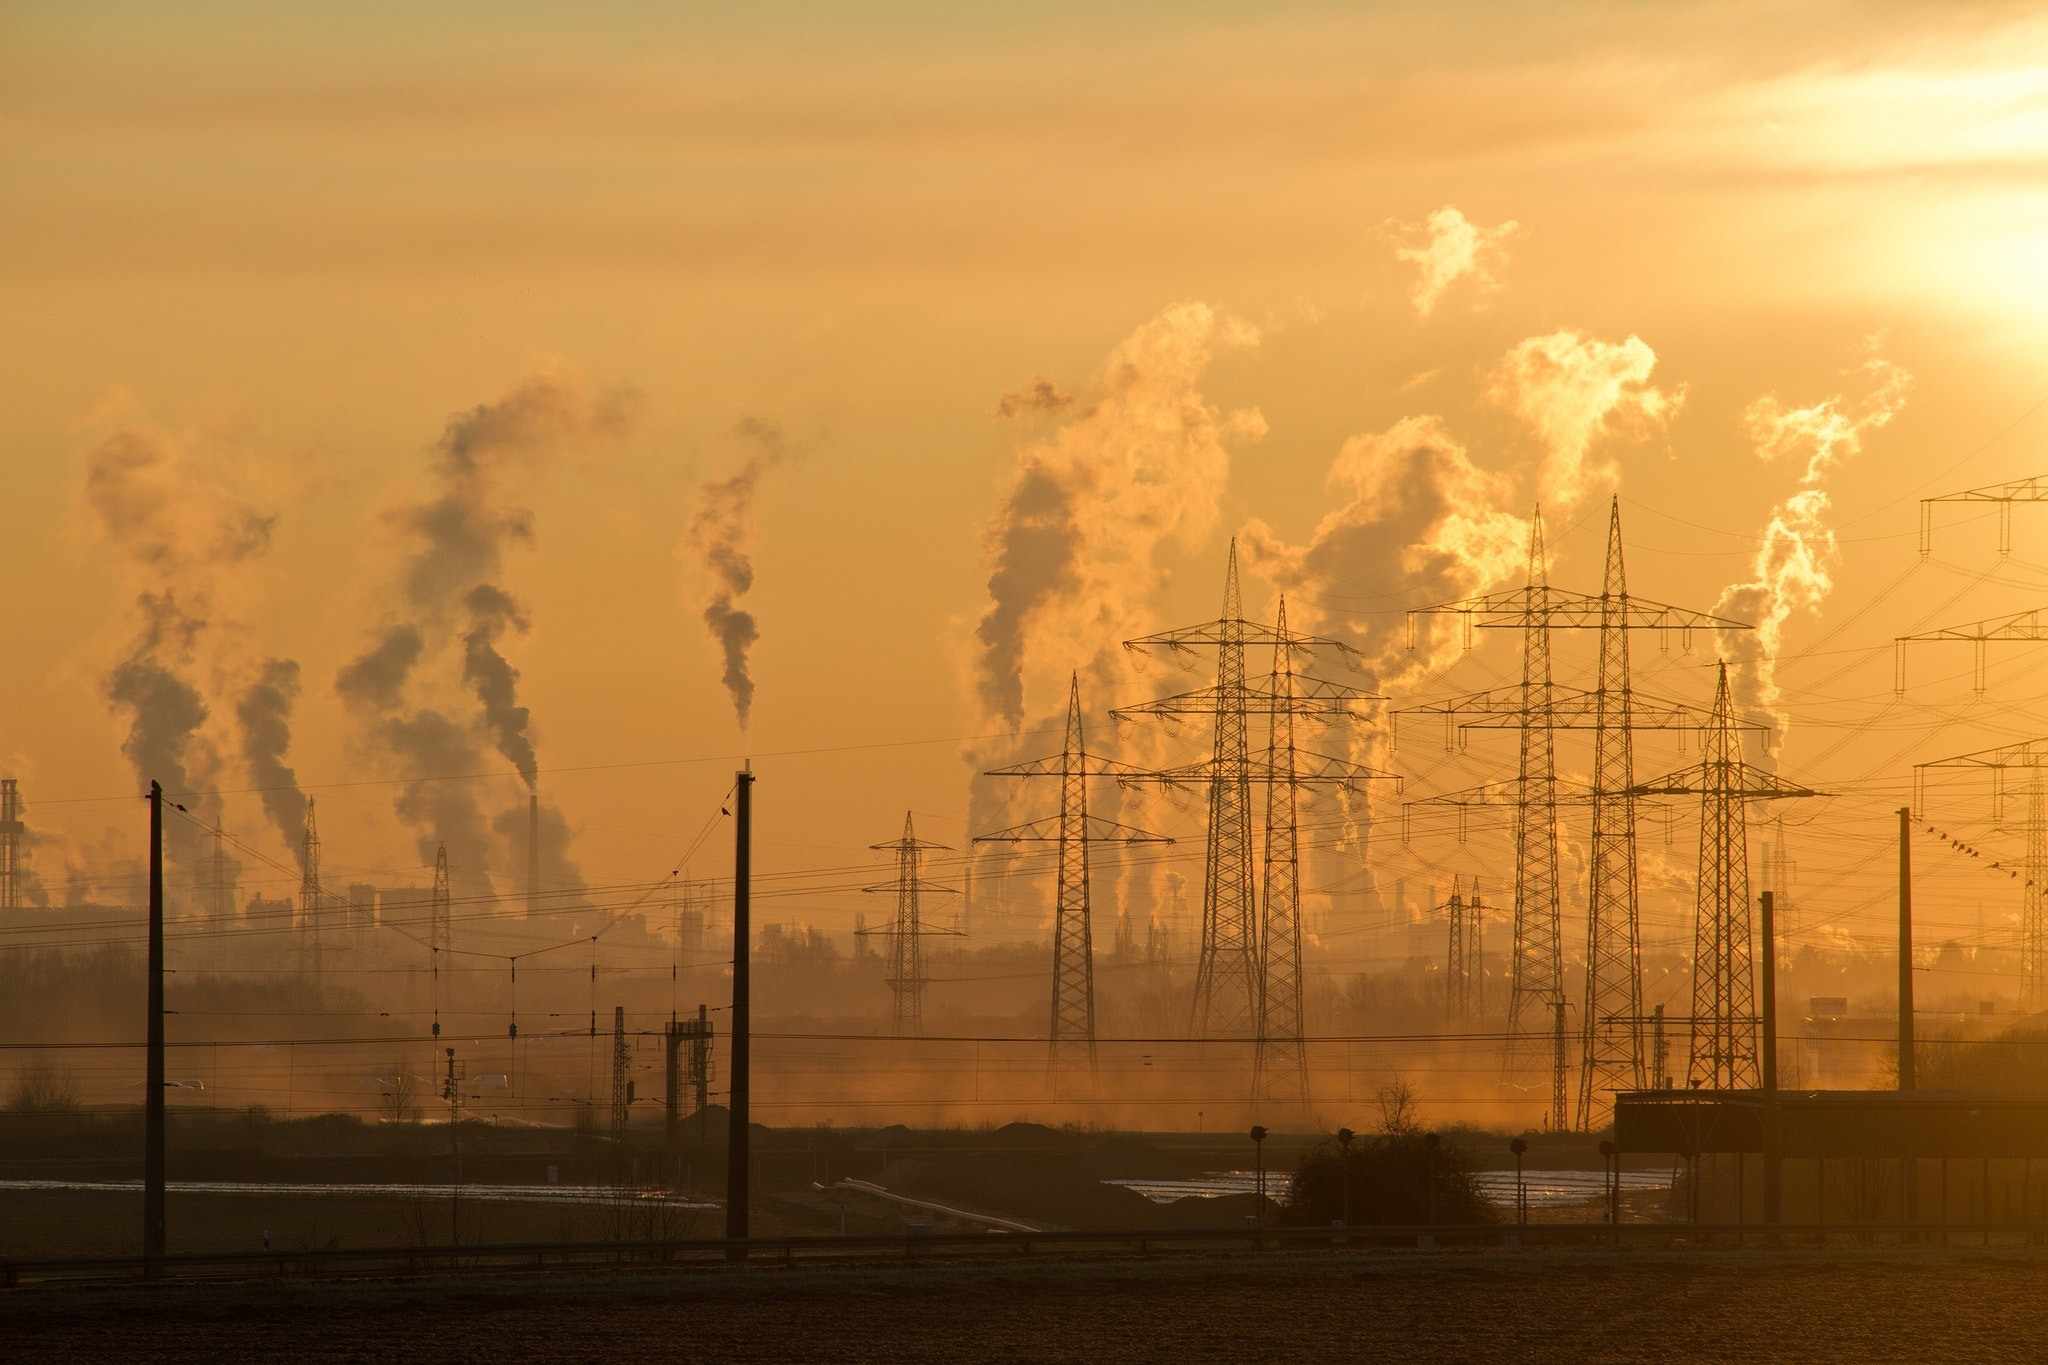 De known unknowns van klimaatopwarming